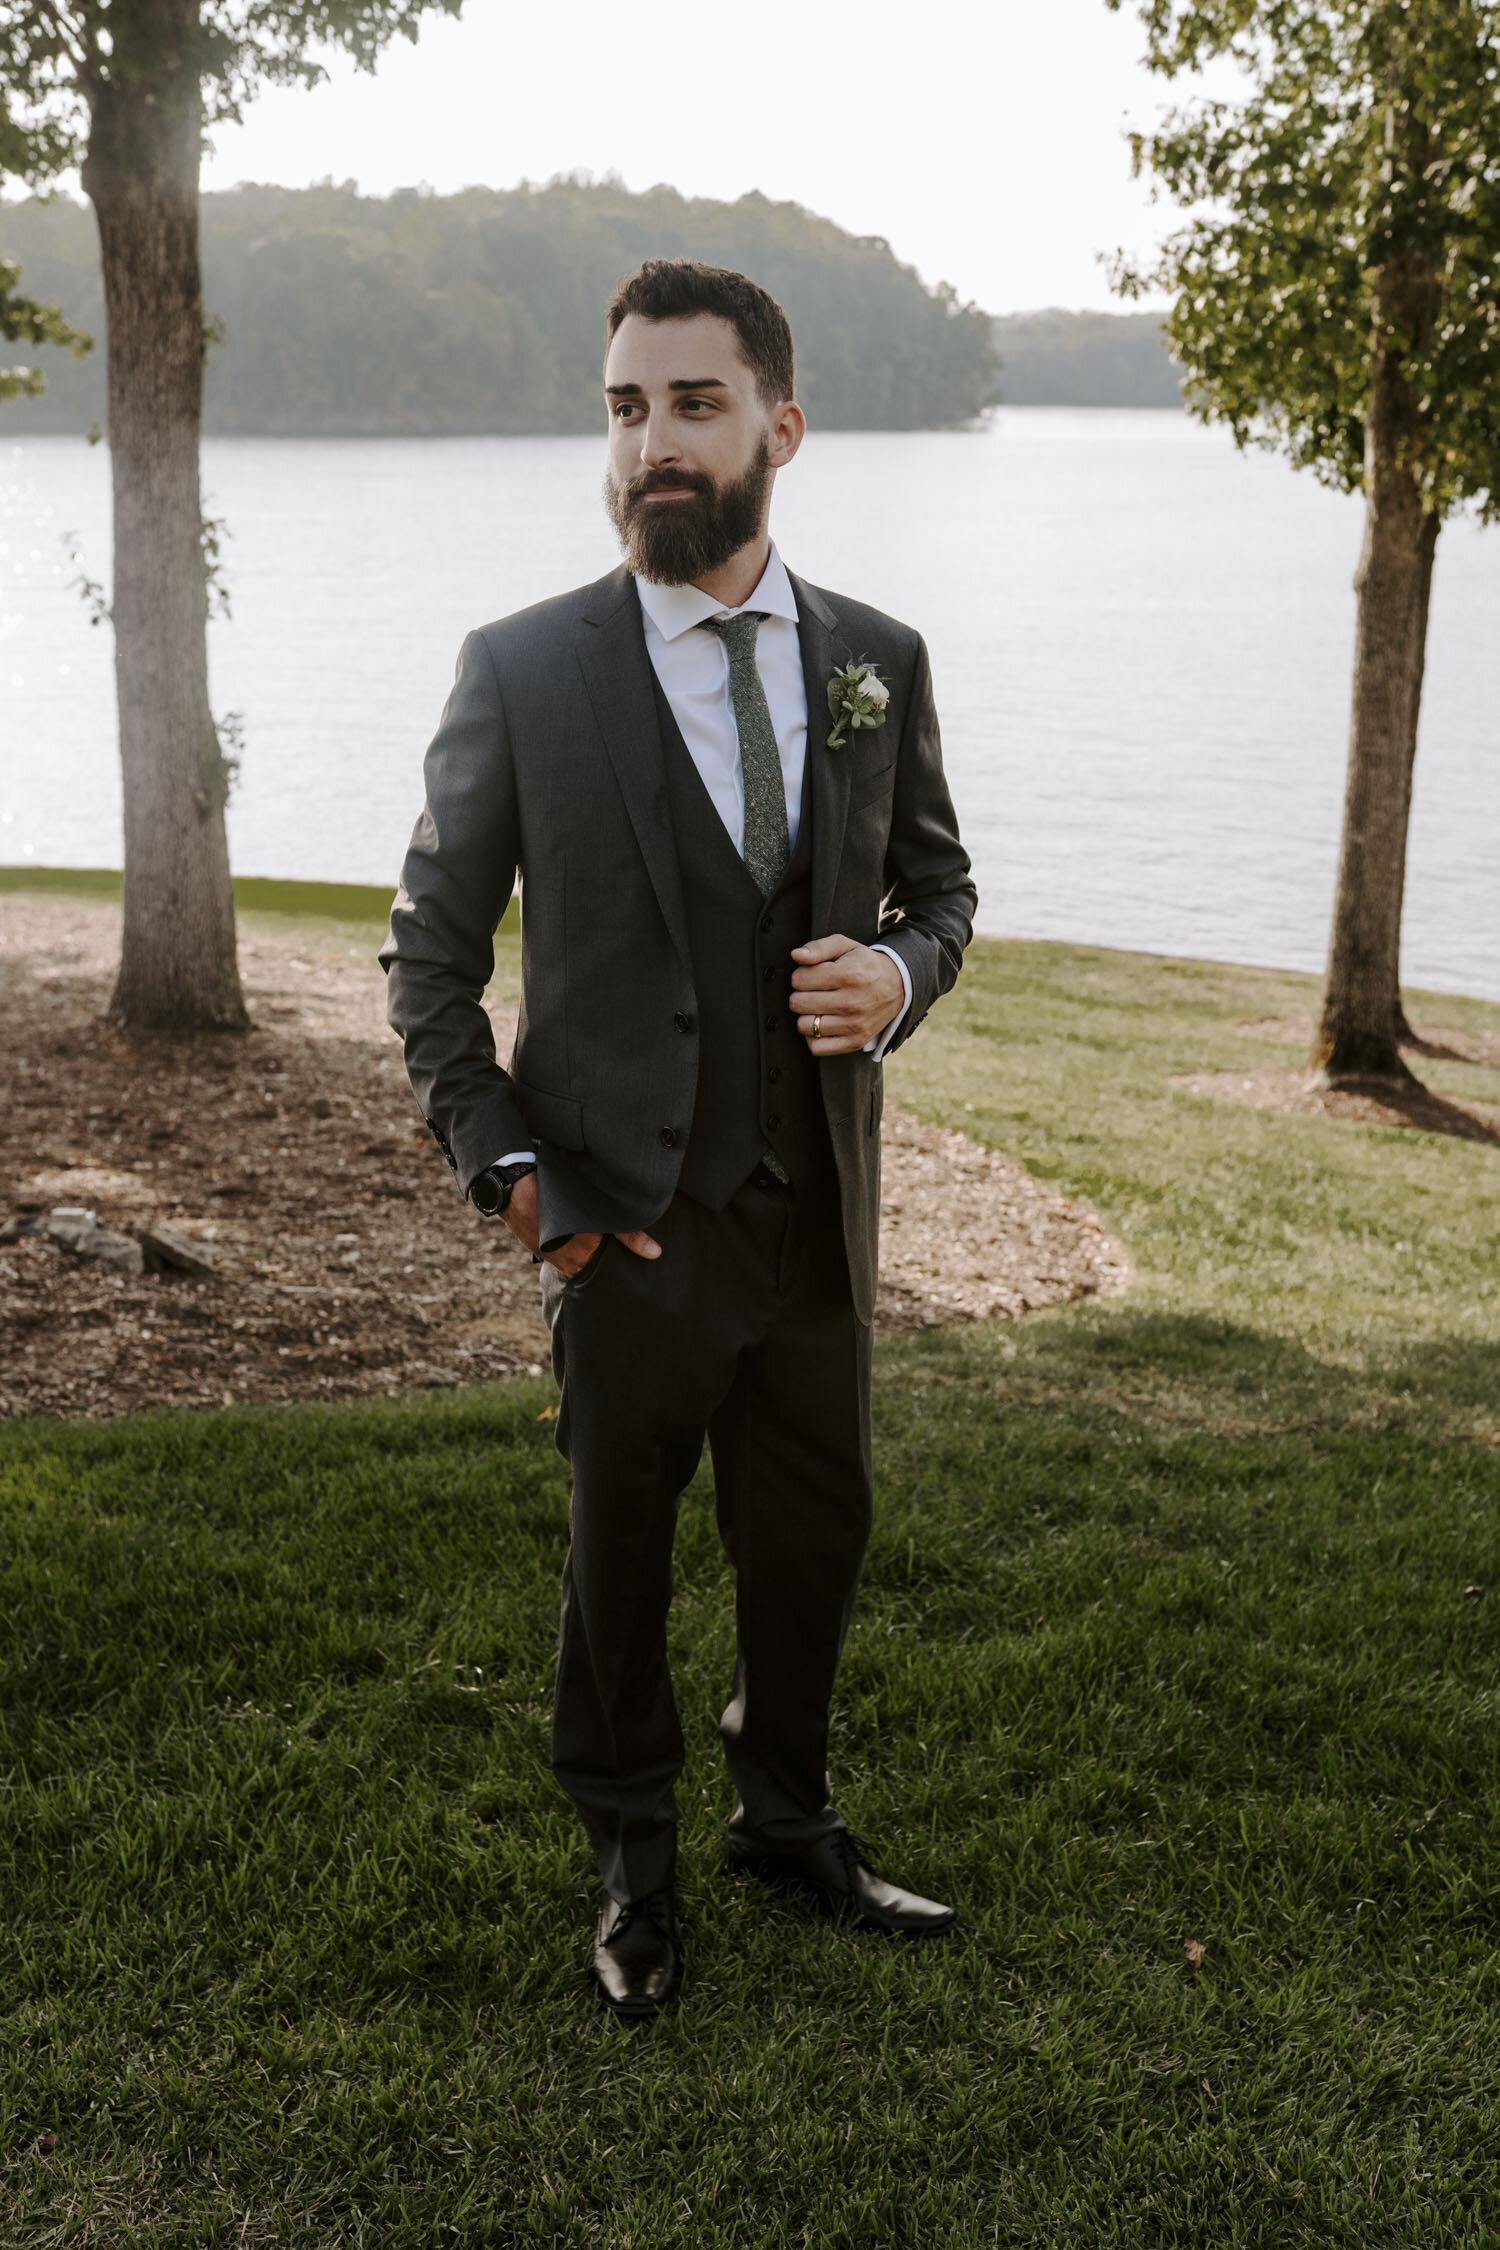 Intimate bride and groom portraits at Bella Collina   By Greensboro, NC Wedding Photographer: Kayli LaFon Photography